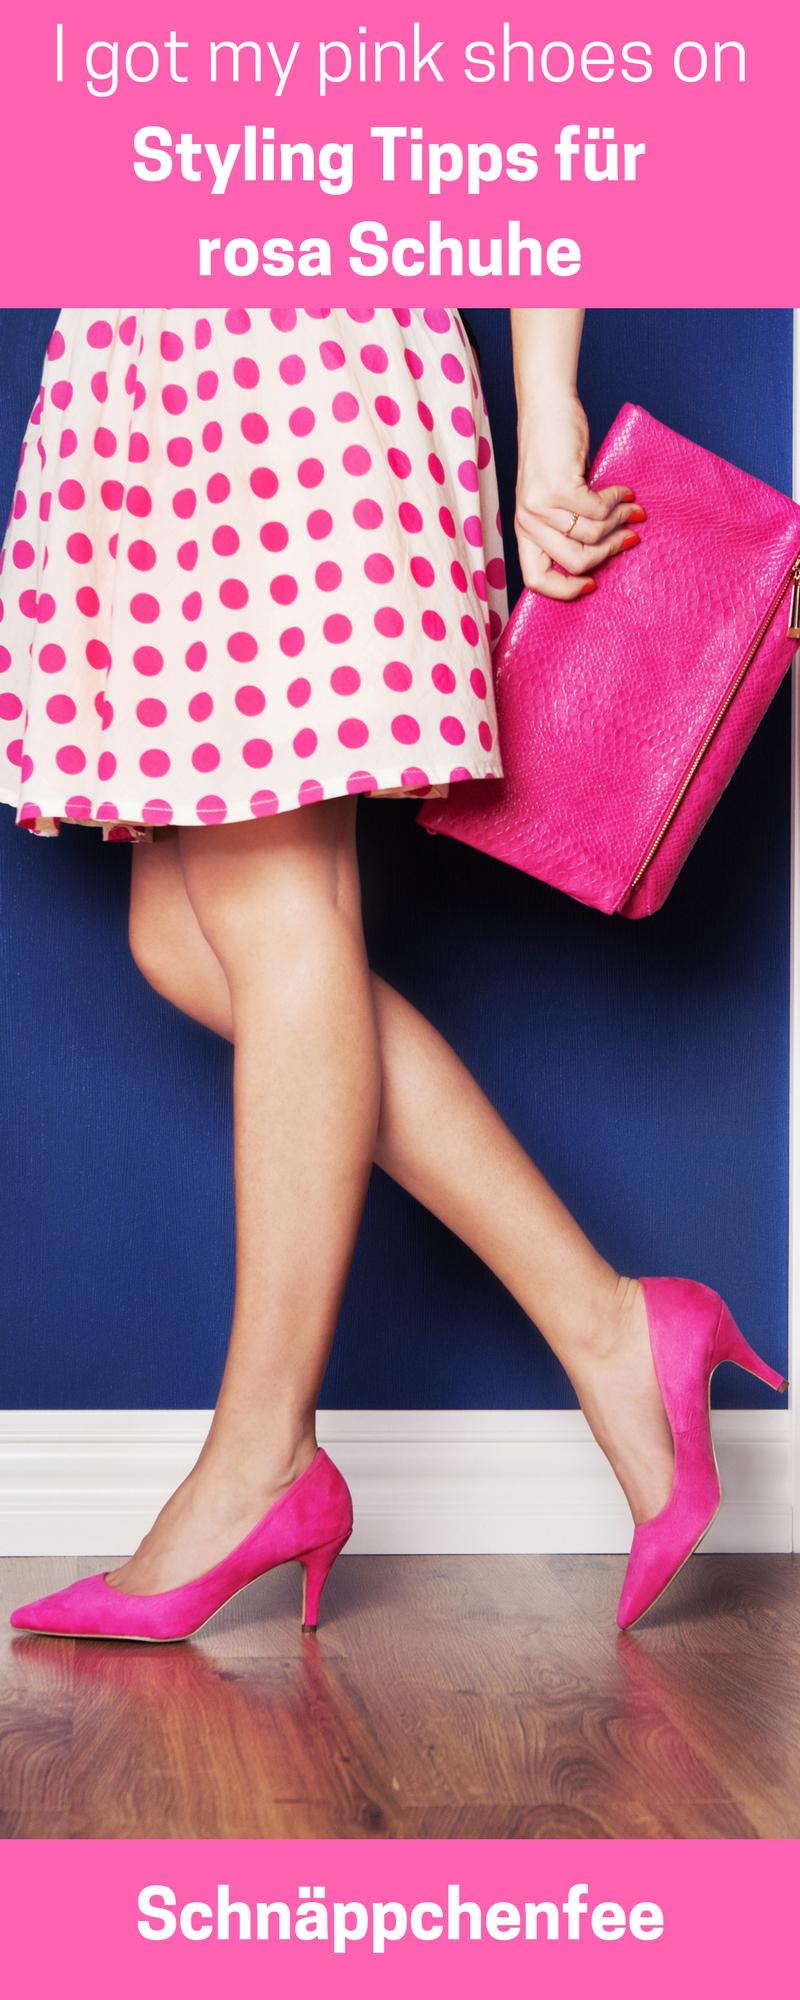 Rosa Schuhe kombinieren: Die schönsten Frühlingsoutfits